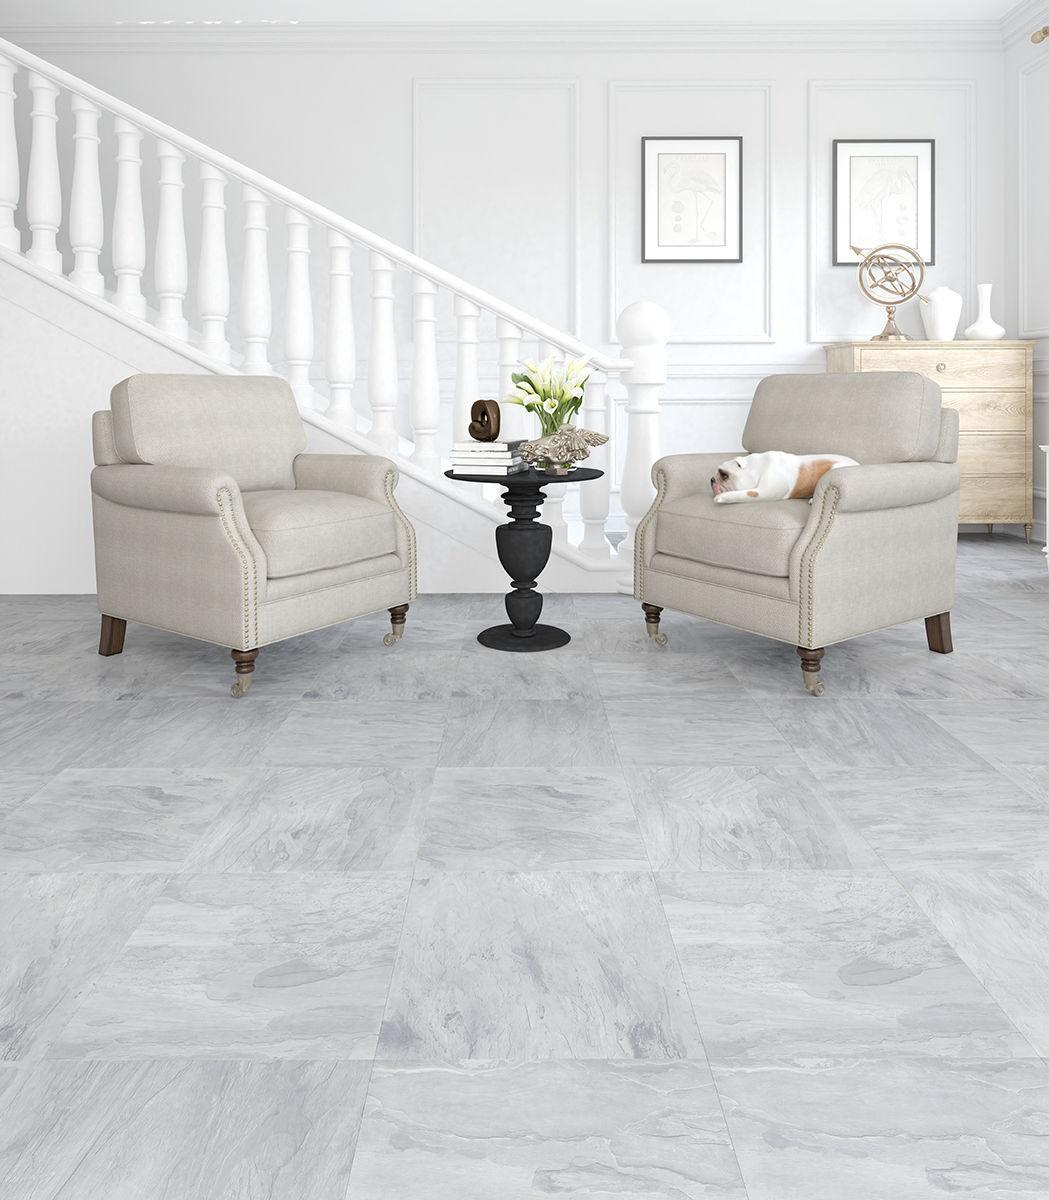 Laminated look hdf laminate flooring / floating / stone look / tile look - slate BQSODGQ